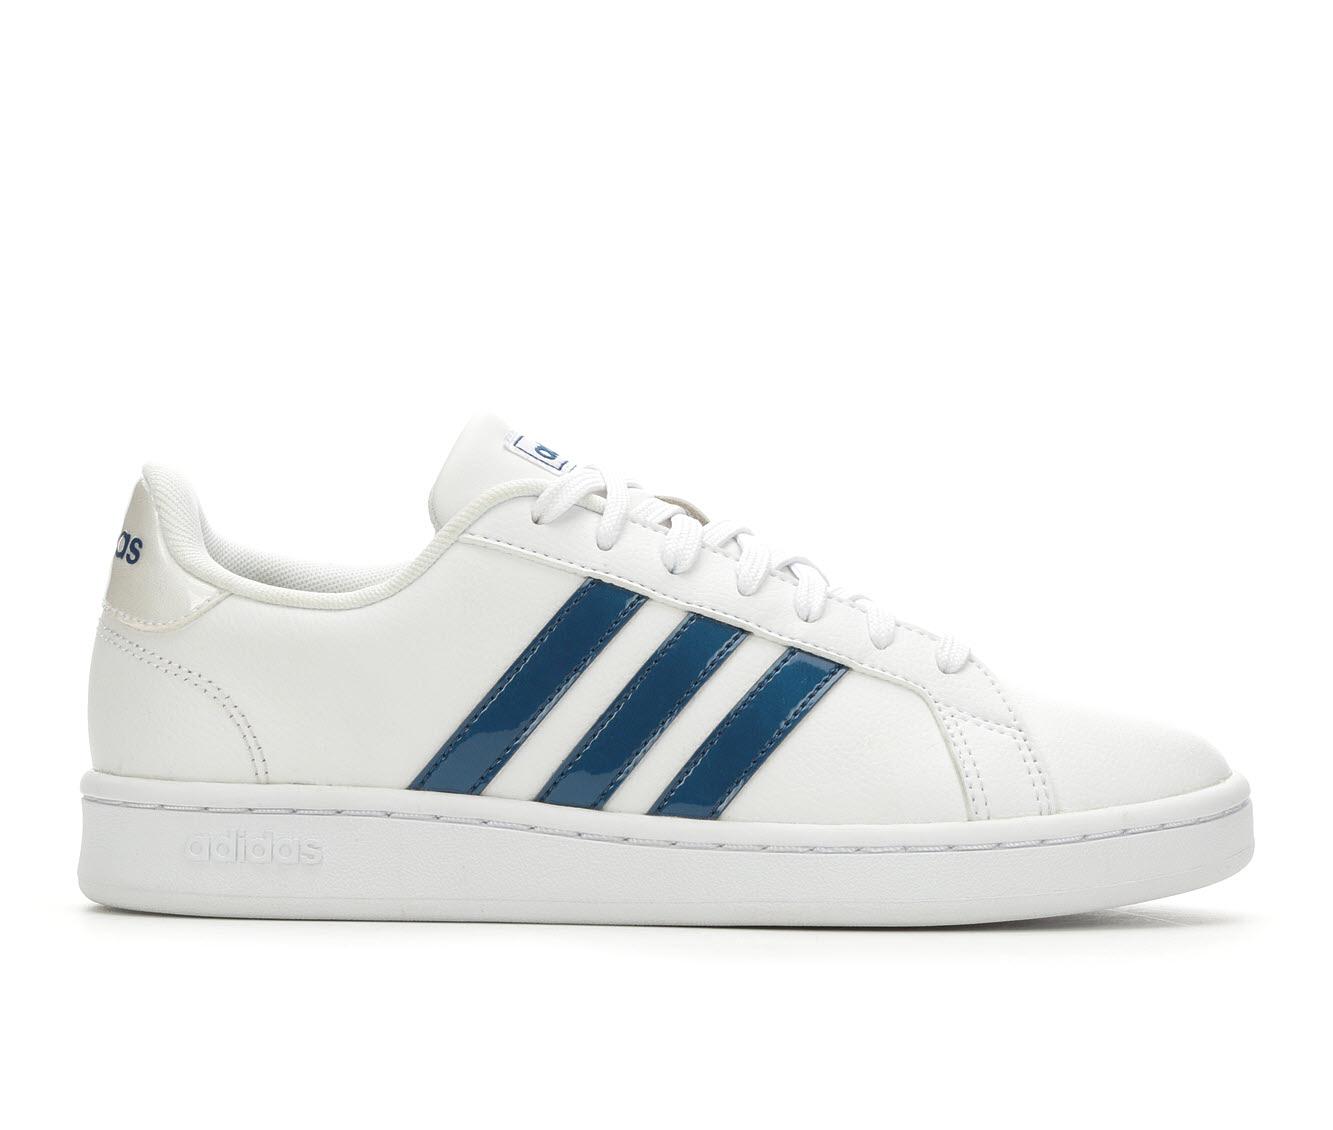 Adidas Grand Court Women's Athletic Shoe (White)